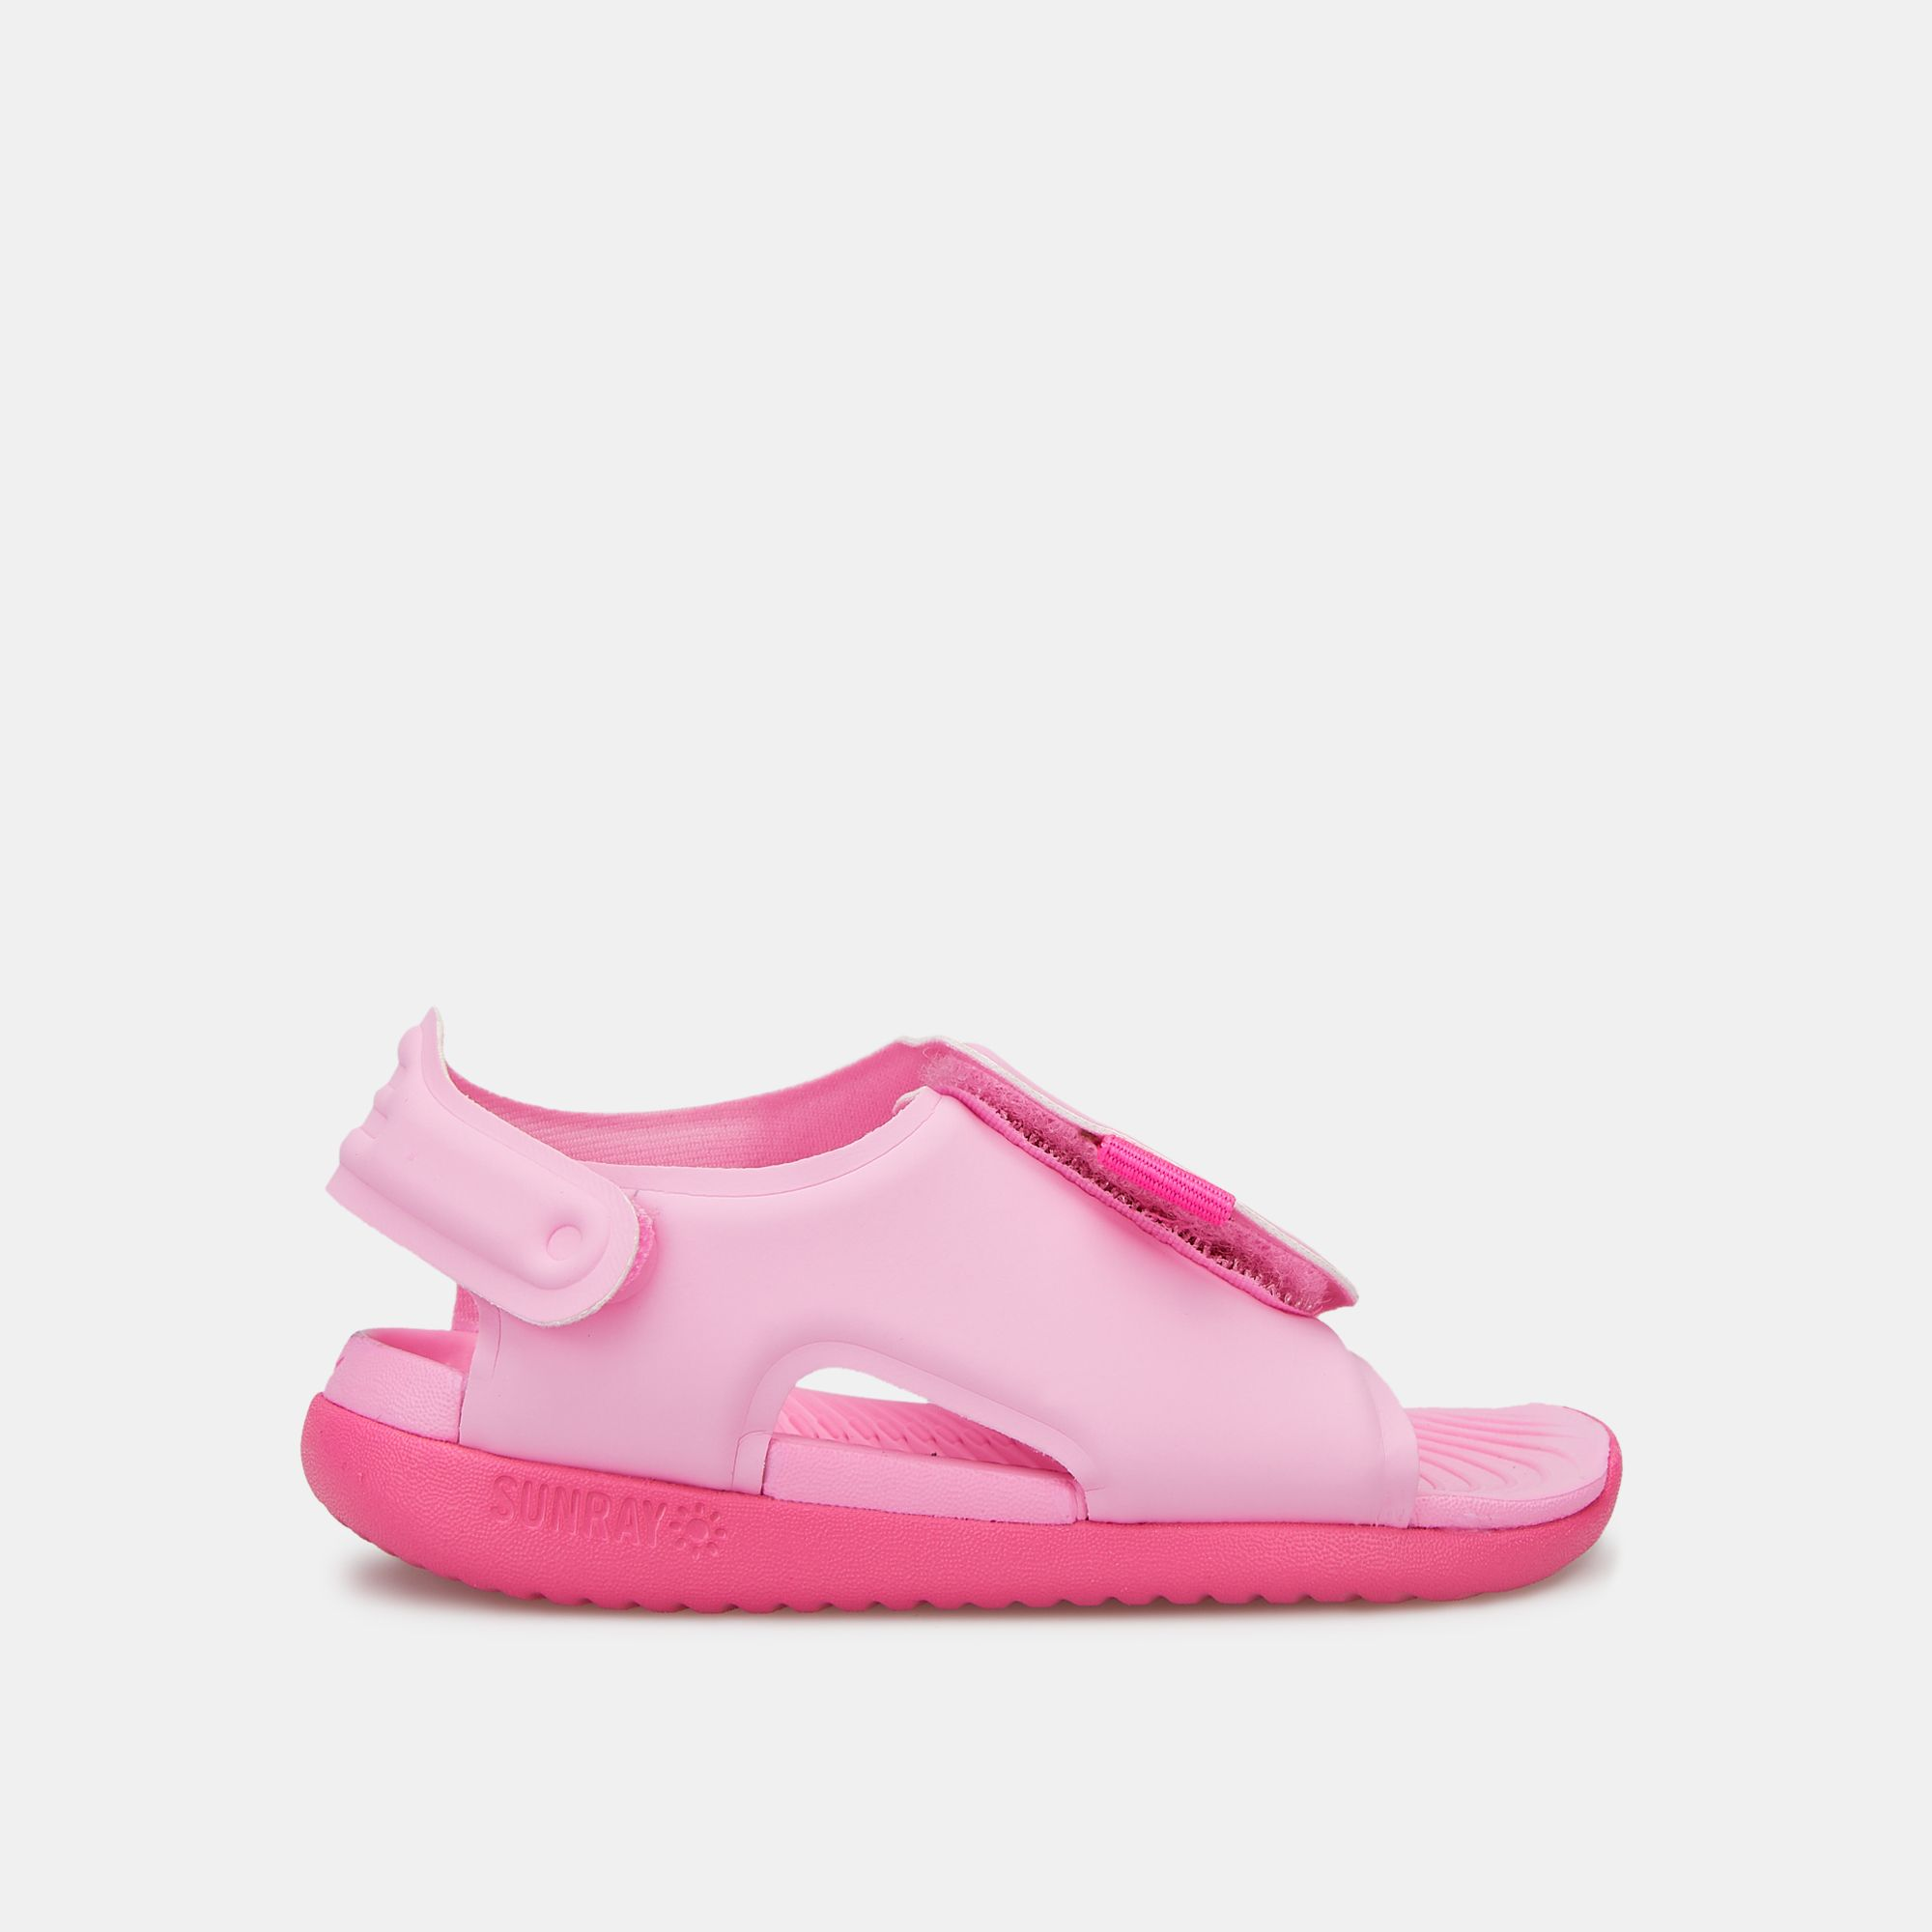 43b40f6f1abfa1 Nike Kids  Sunray Adjust 5 (Baby and Toddler)